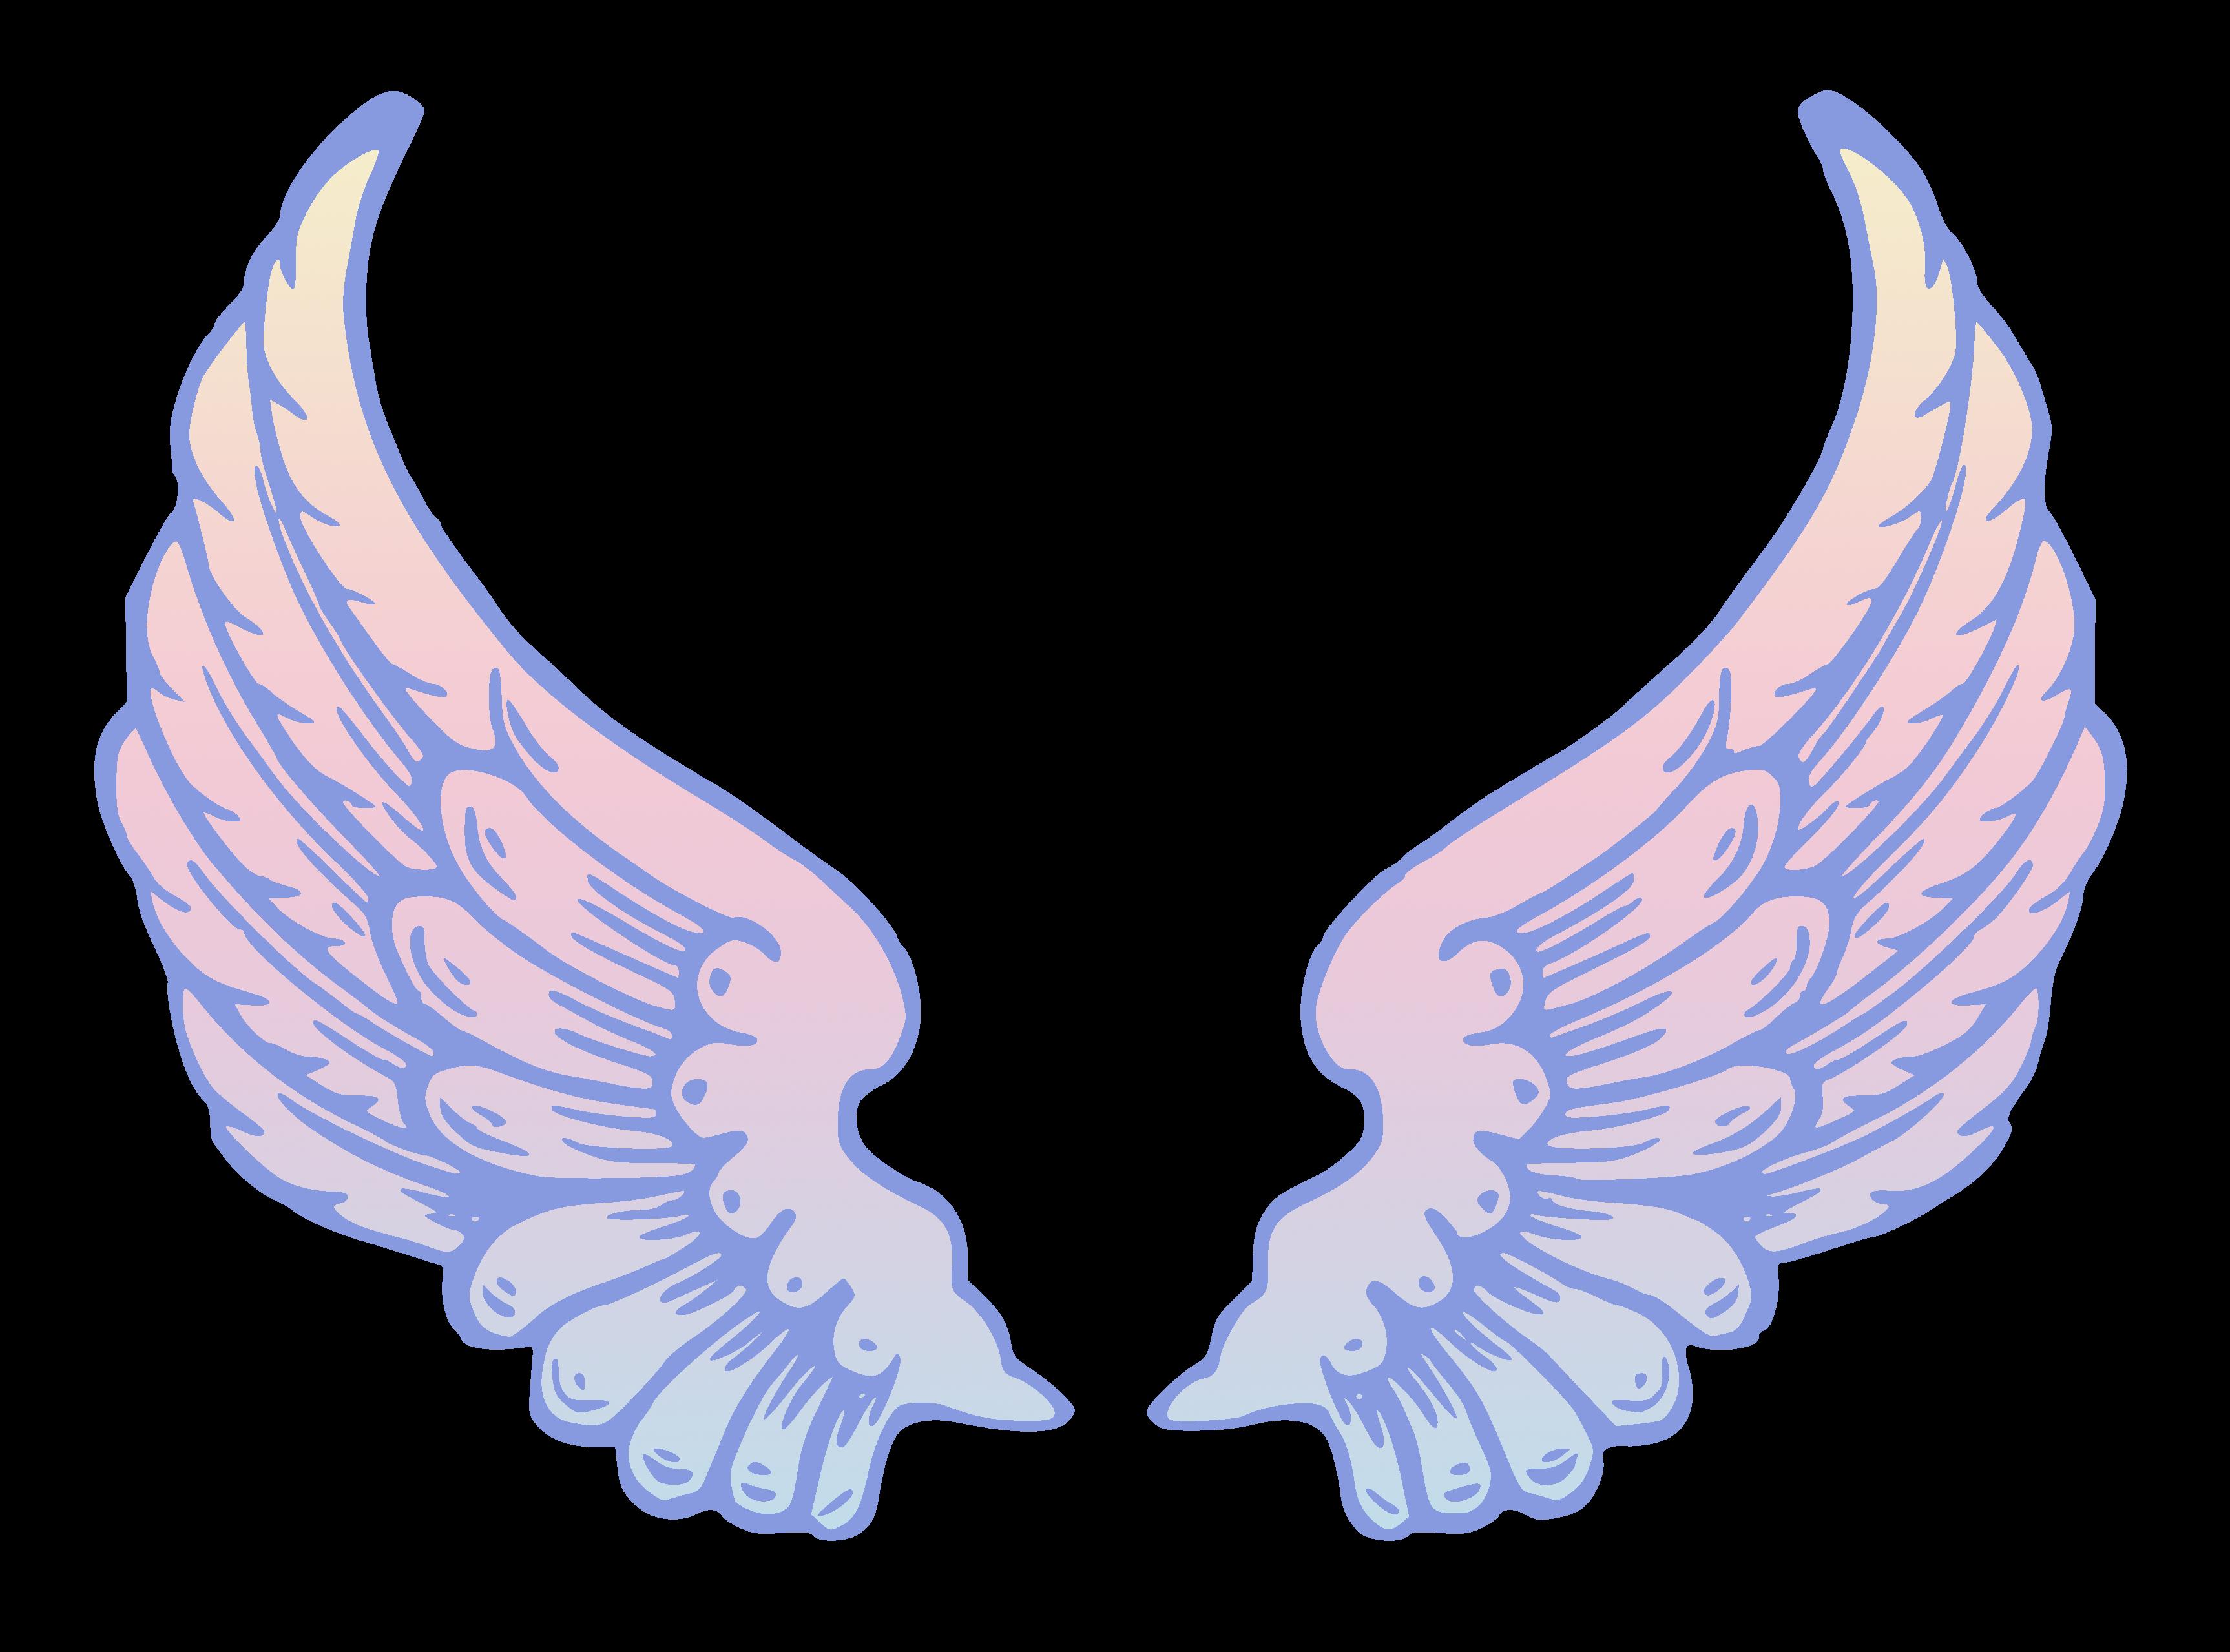 Wing clipart transparent. Angel wings bdfjade hdq